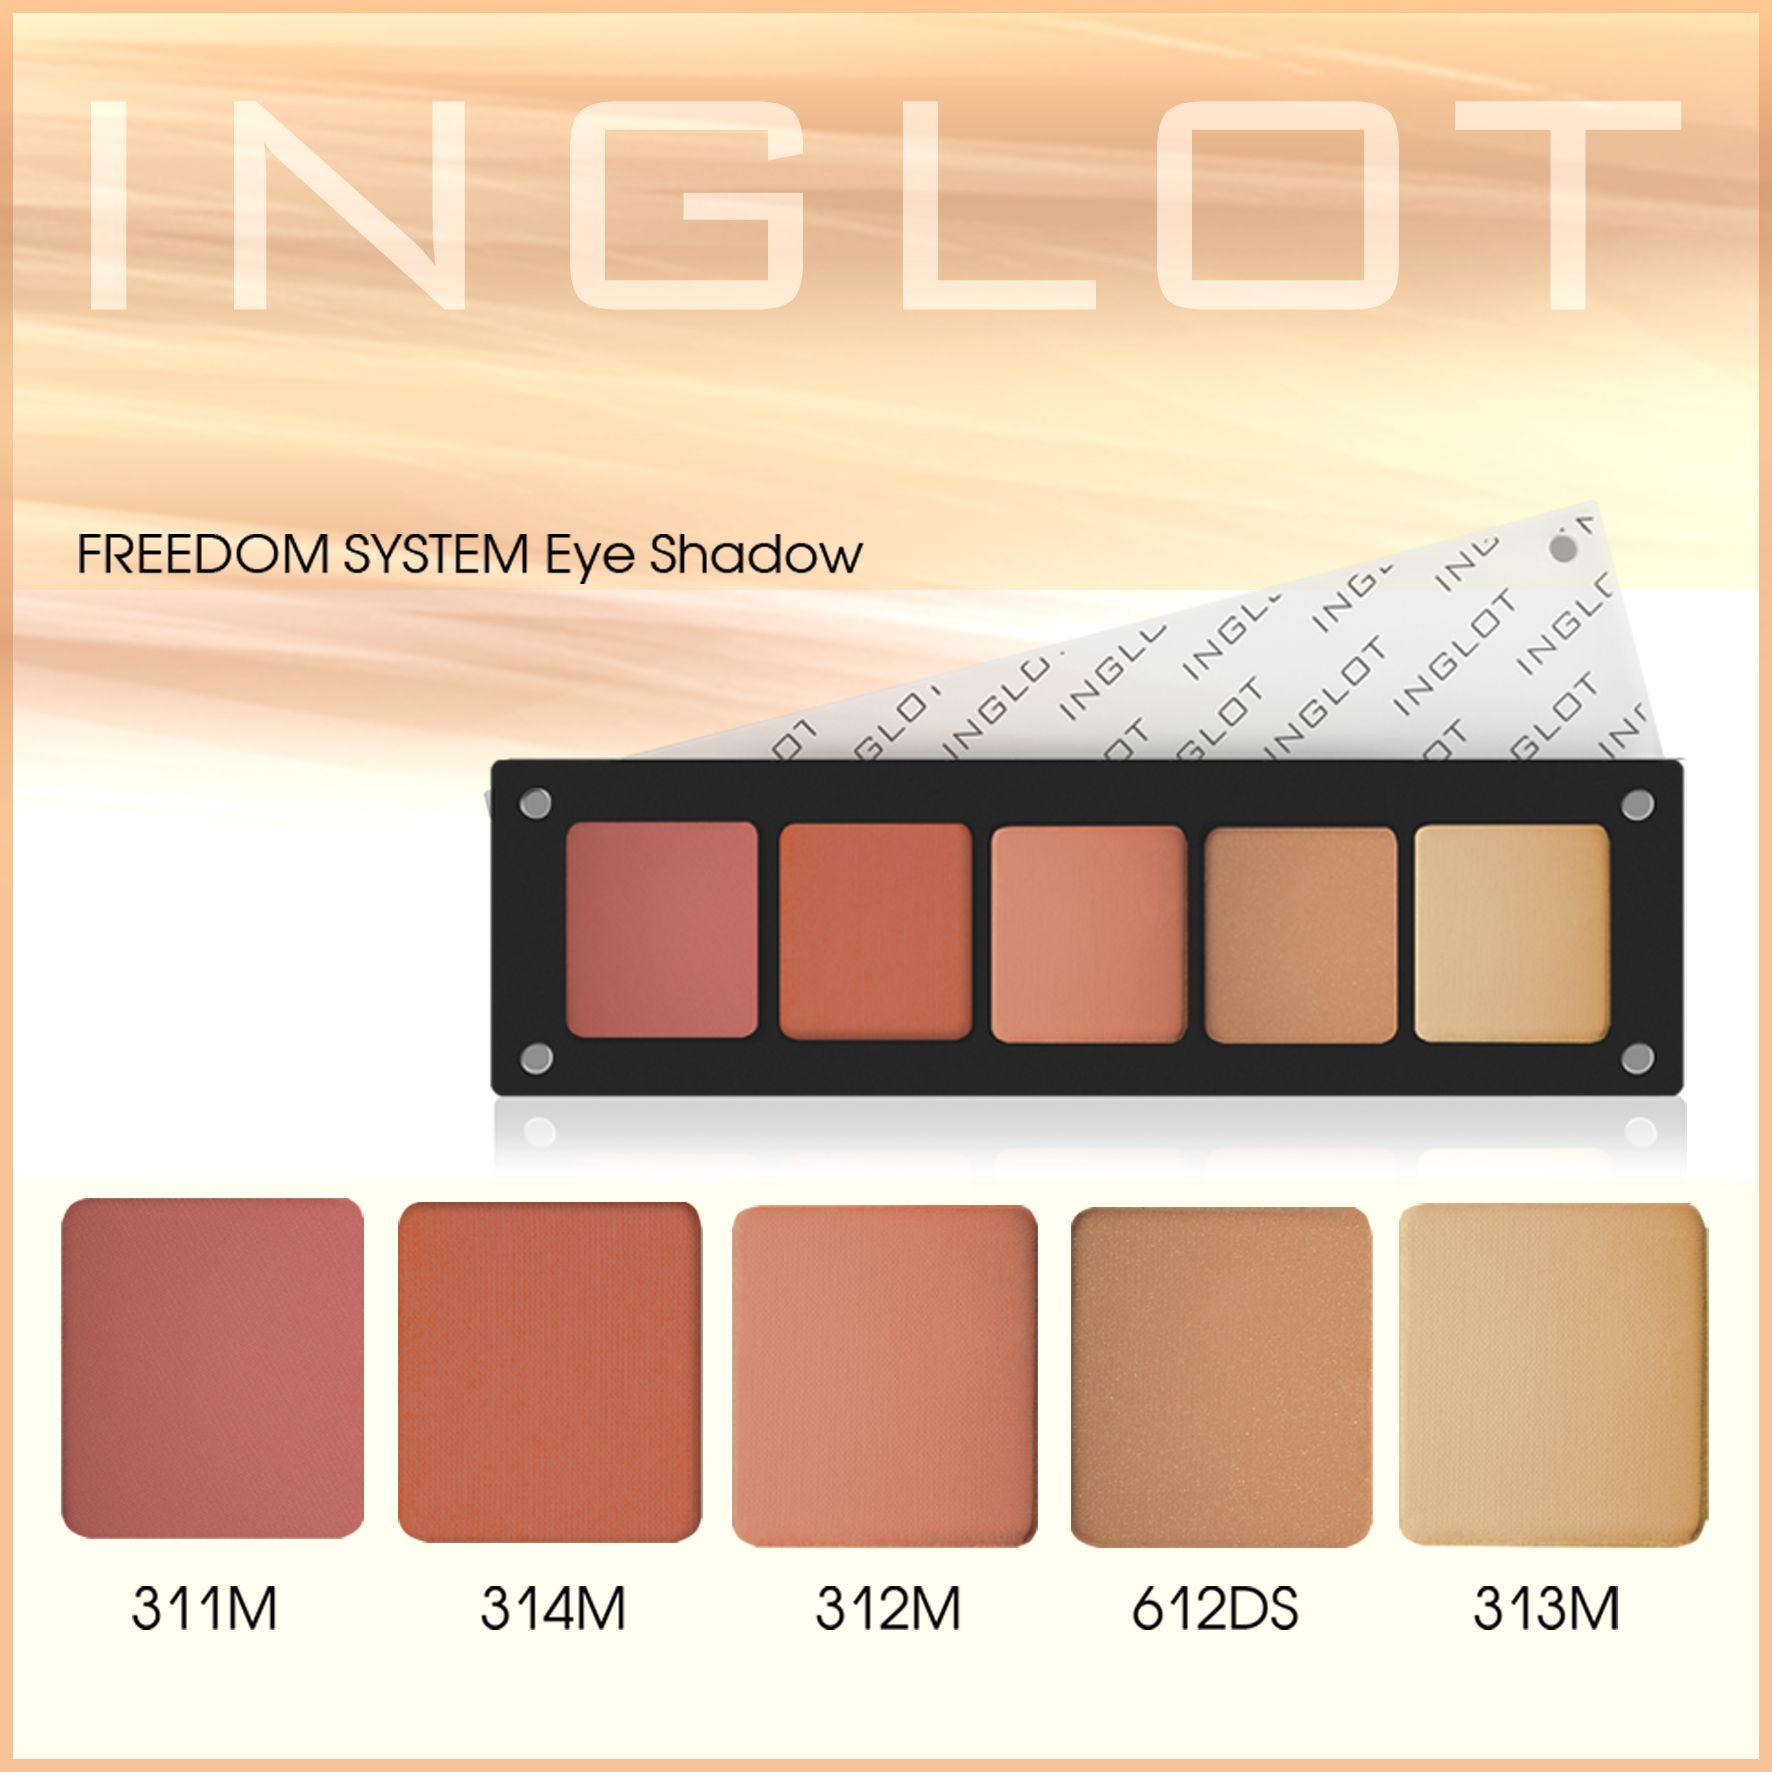 My brights mattes custom palette from Inglot. #Eyeshadows